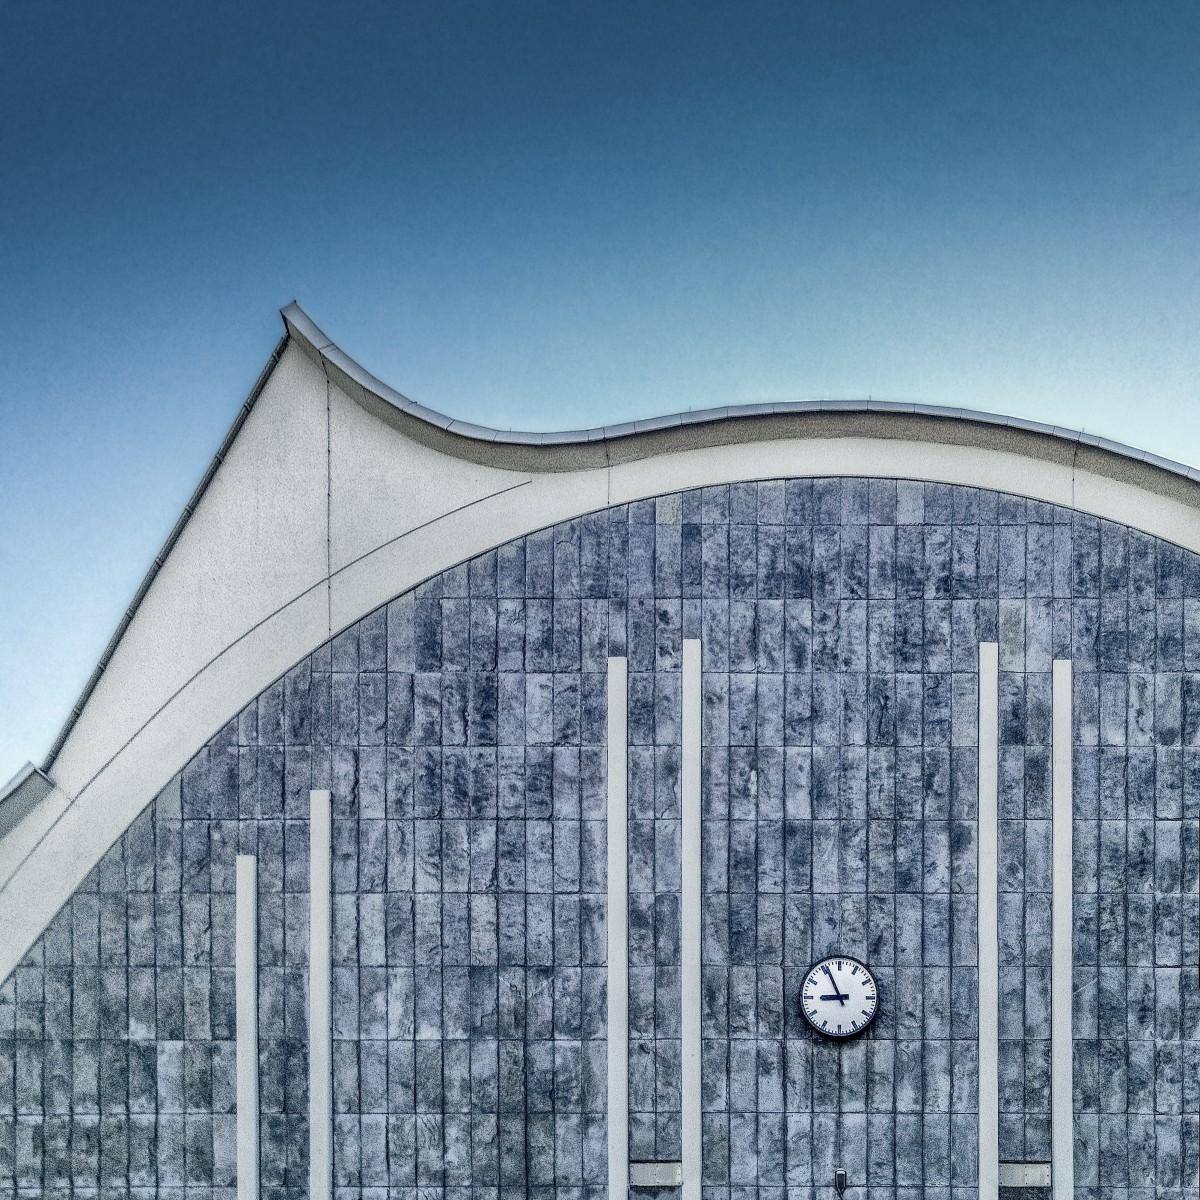 Fotos Gratis Arquitectura Espiral Edificio Piedra Exterior California Ilustraci N